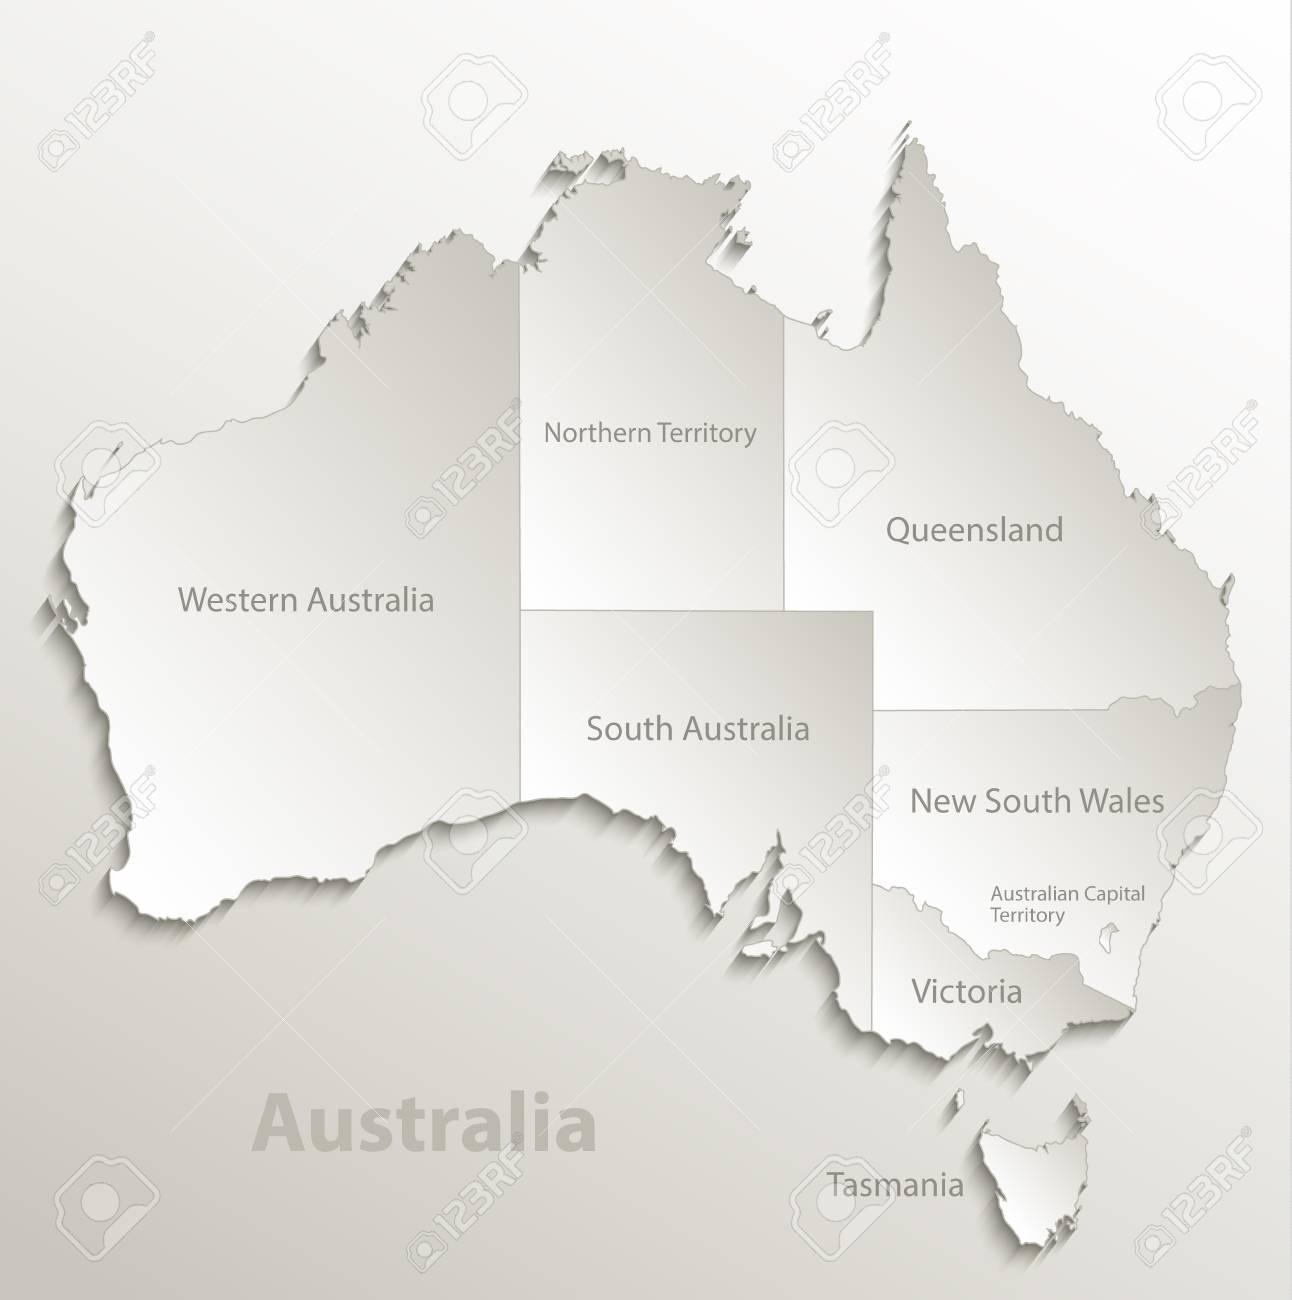 3d Map Of South Australia.Australia Map Separate Region Individual Names Card Paper 3d